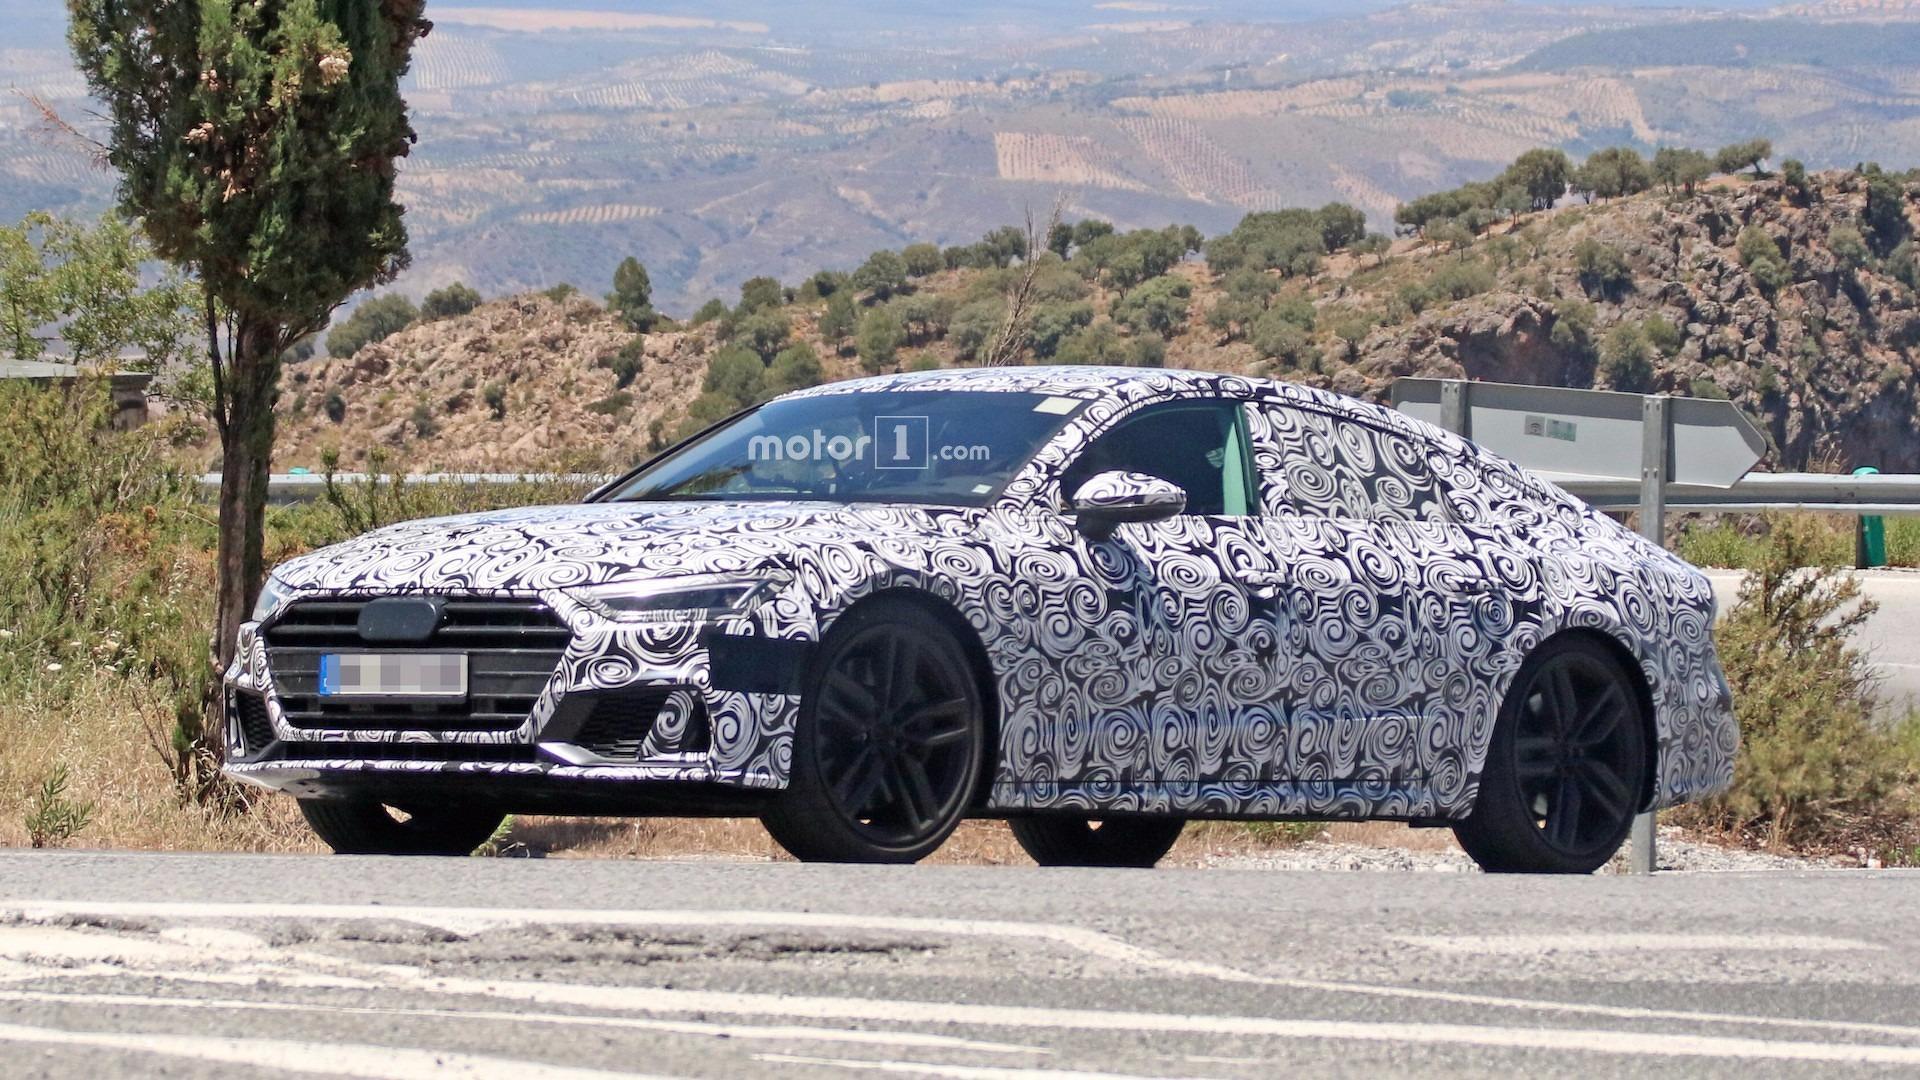 2018 Audi S7 Spied Revealing Sharp New Details